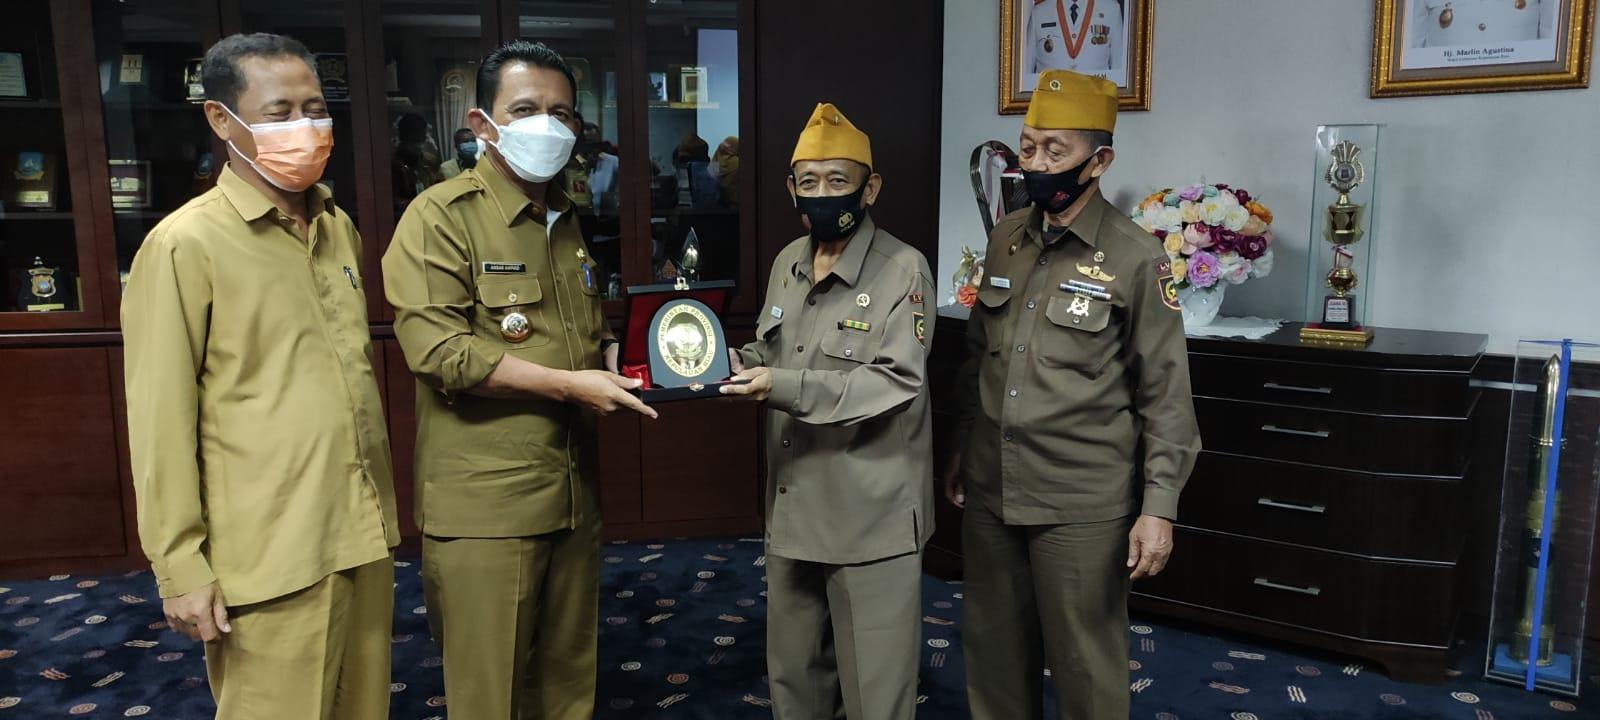 Foto Ansar Ahmad, gubernur ansar ahmad, kepri, Kepulauan Riau, legiun veteran, lvri